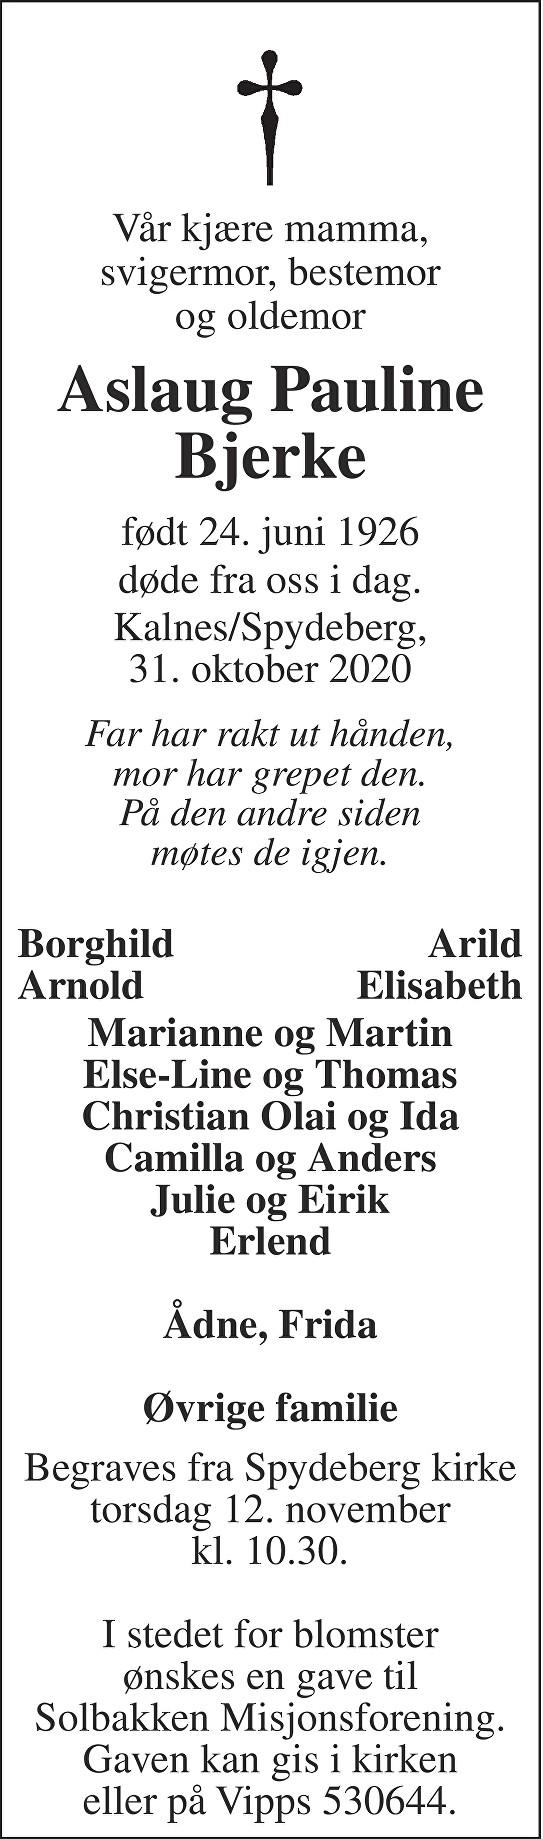 Aslaug Pauline Bjerke Dødsannonse